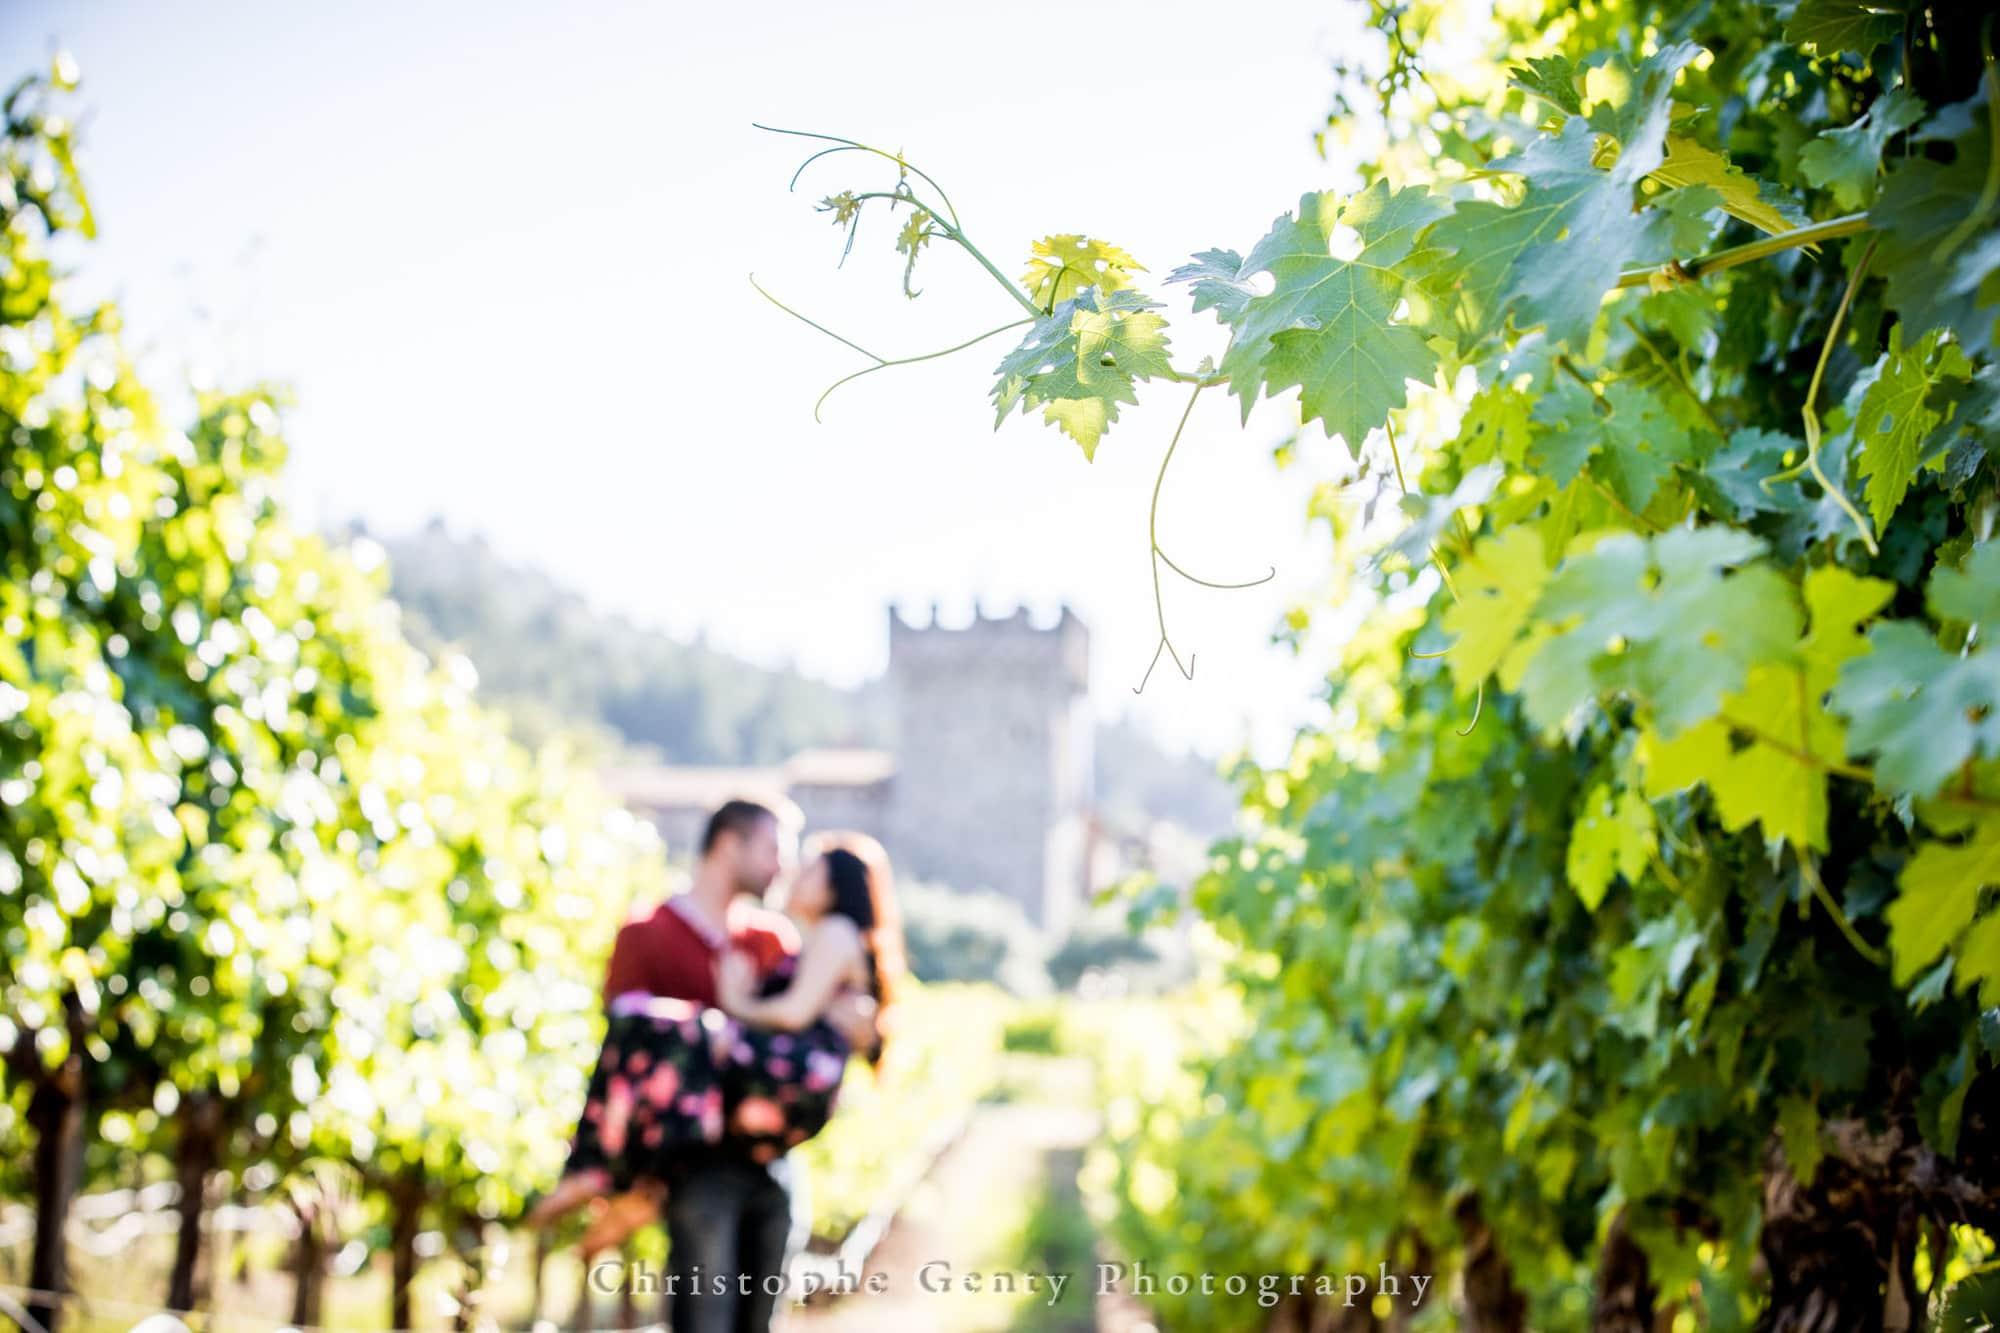 Castello di Amorosa Marriage Proposal Photography 321